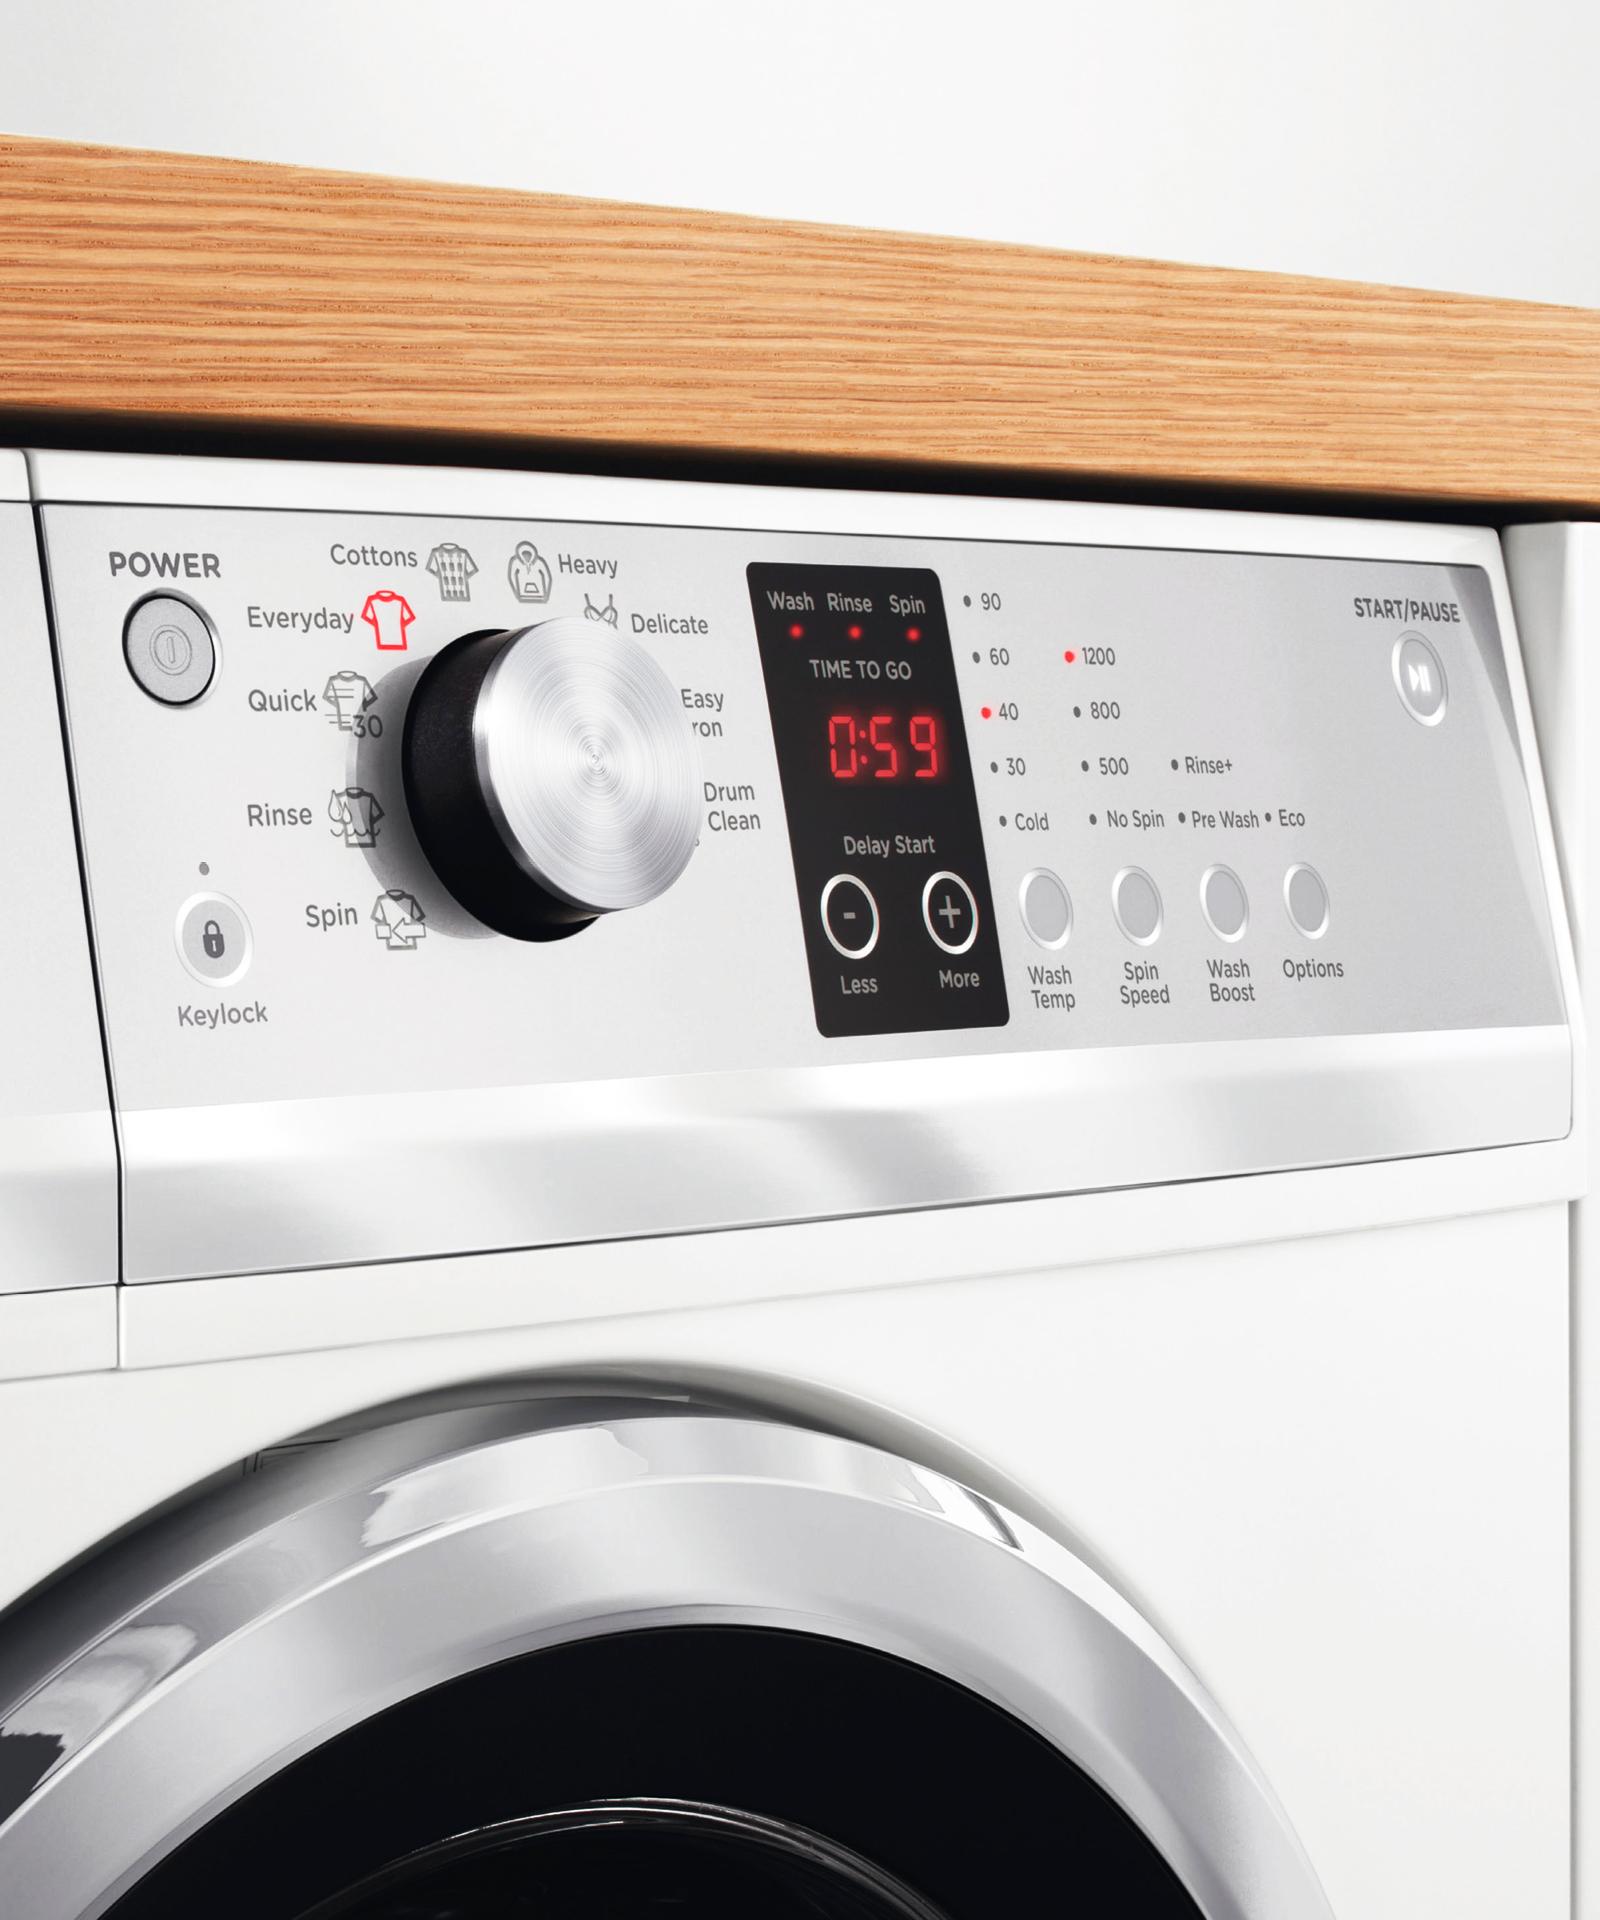 WH7560J3 - Front Loader Washing Machine 7 5kg QuickSmart